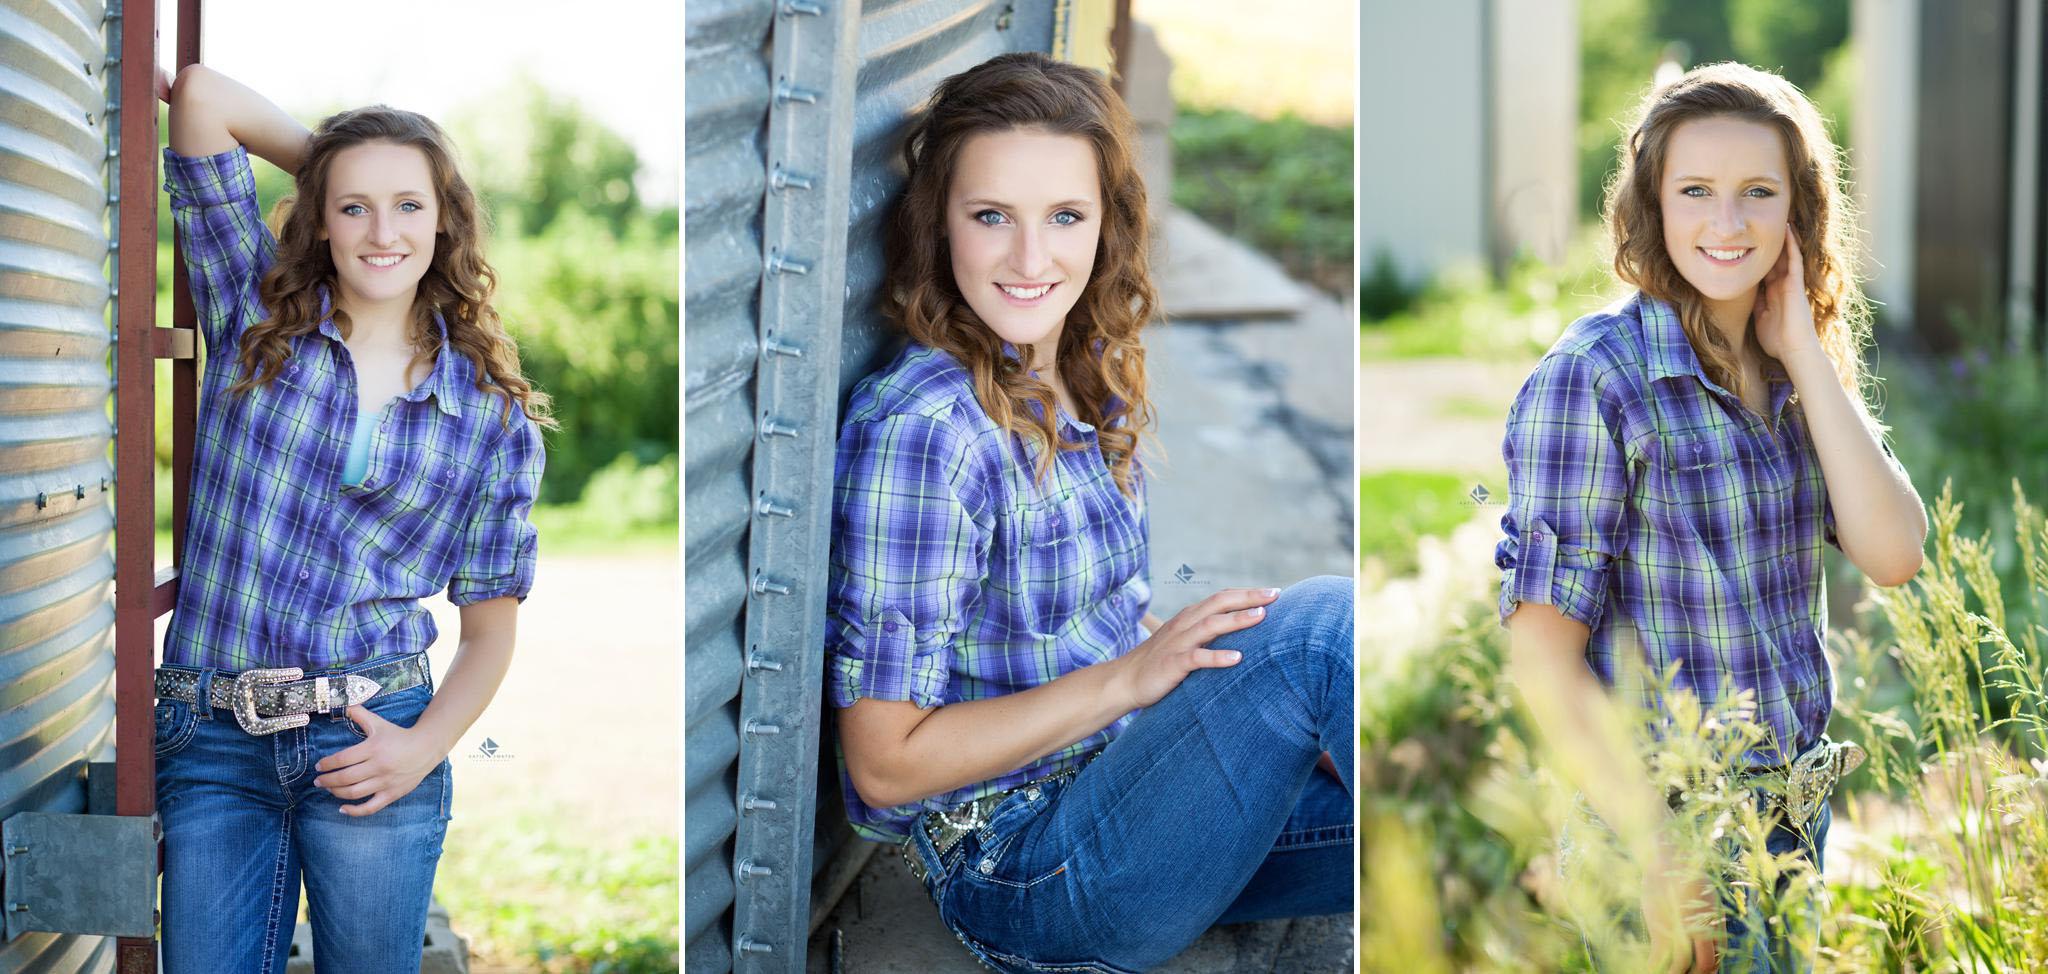 Senior Pictures in South Dakota | Grain Bin Senior Pictures by Katie Swatek Photography | Country Senior Pictures by Katie Swatek Photography